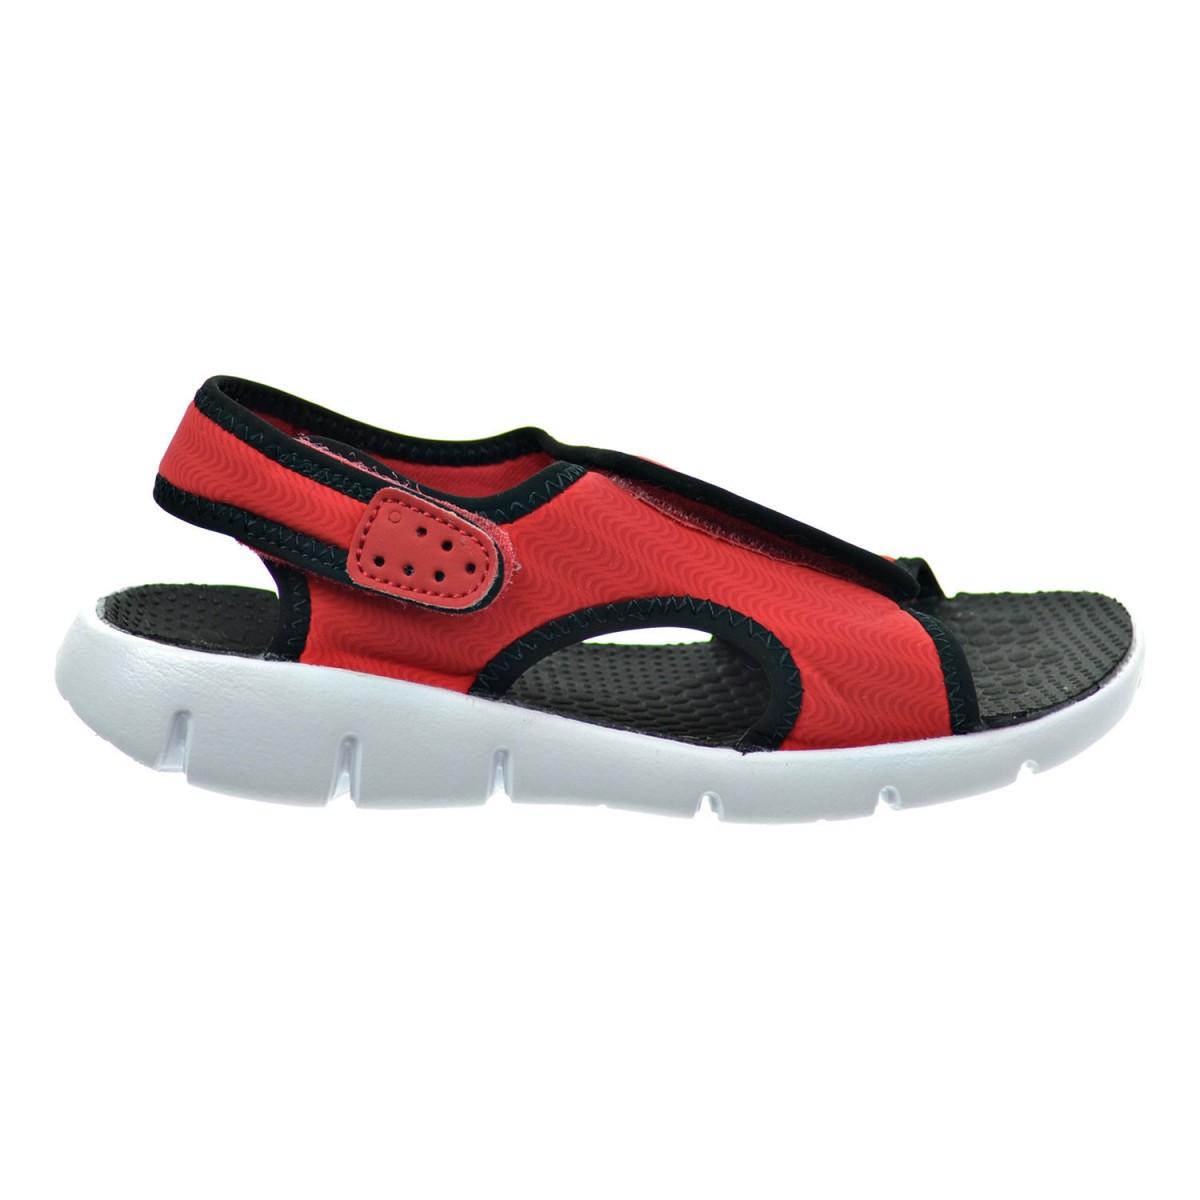 f1fbd6ae2 Bizz Store - Sandália Papete Infantil Nike Sunray Adjust 4